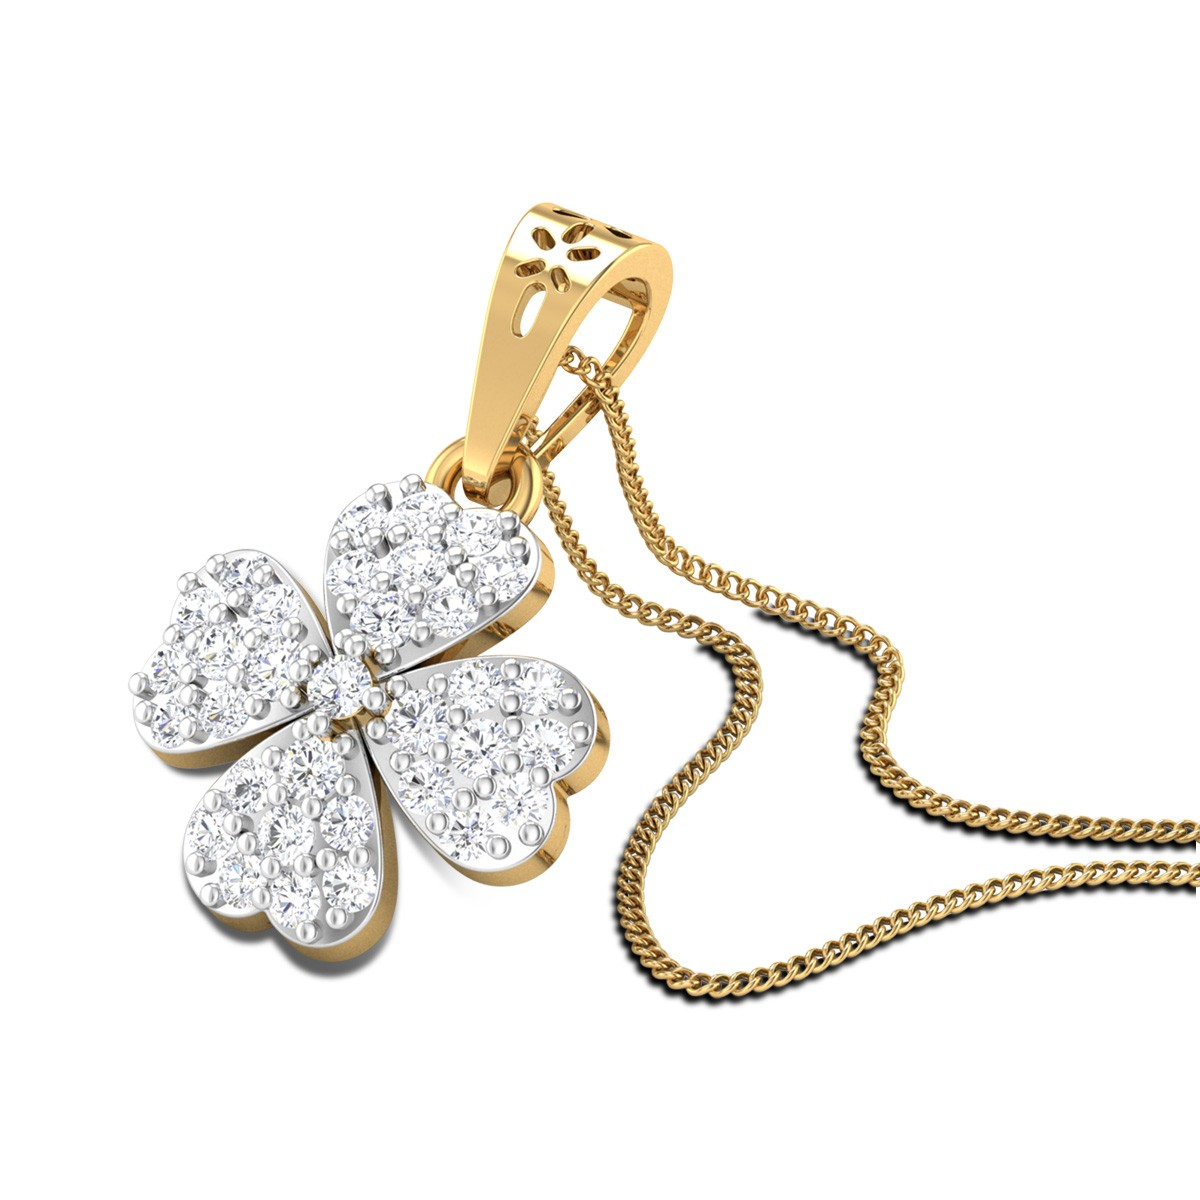 Rosemerry Diamond Pendant